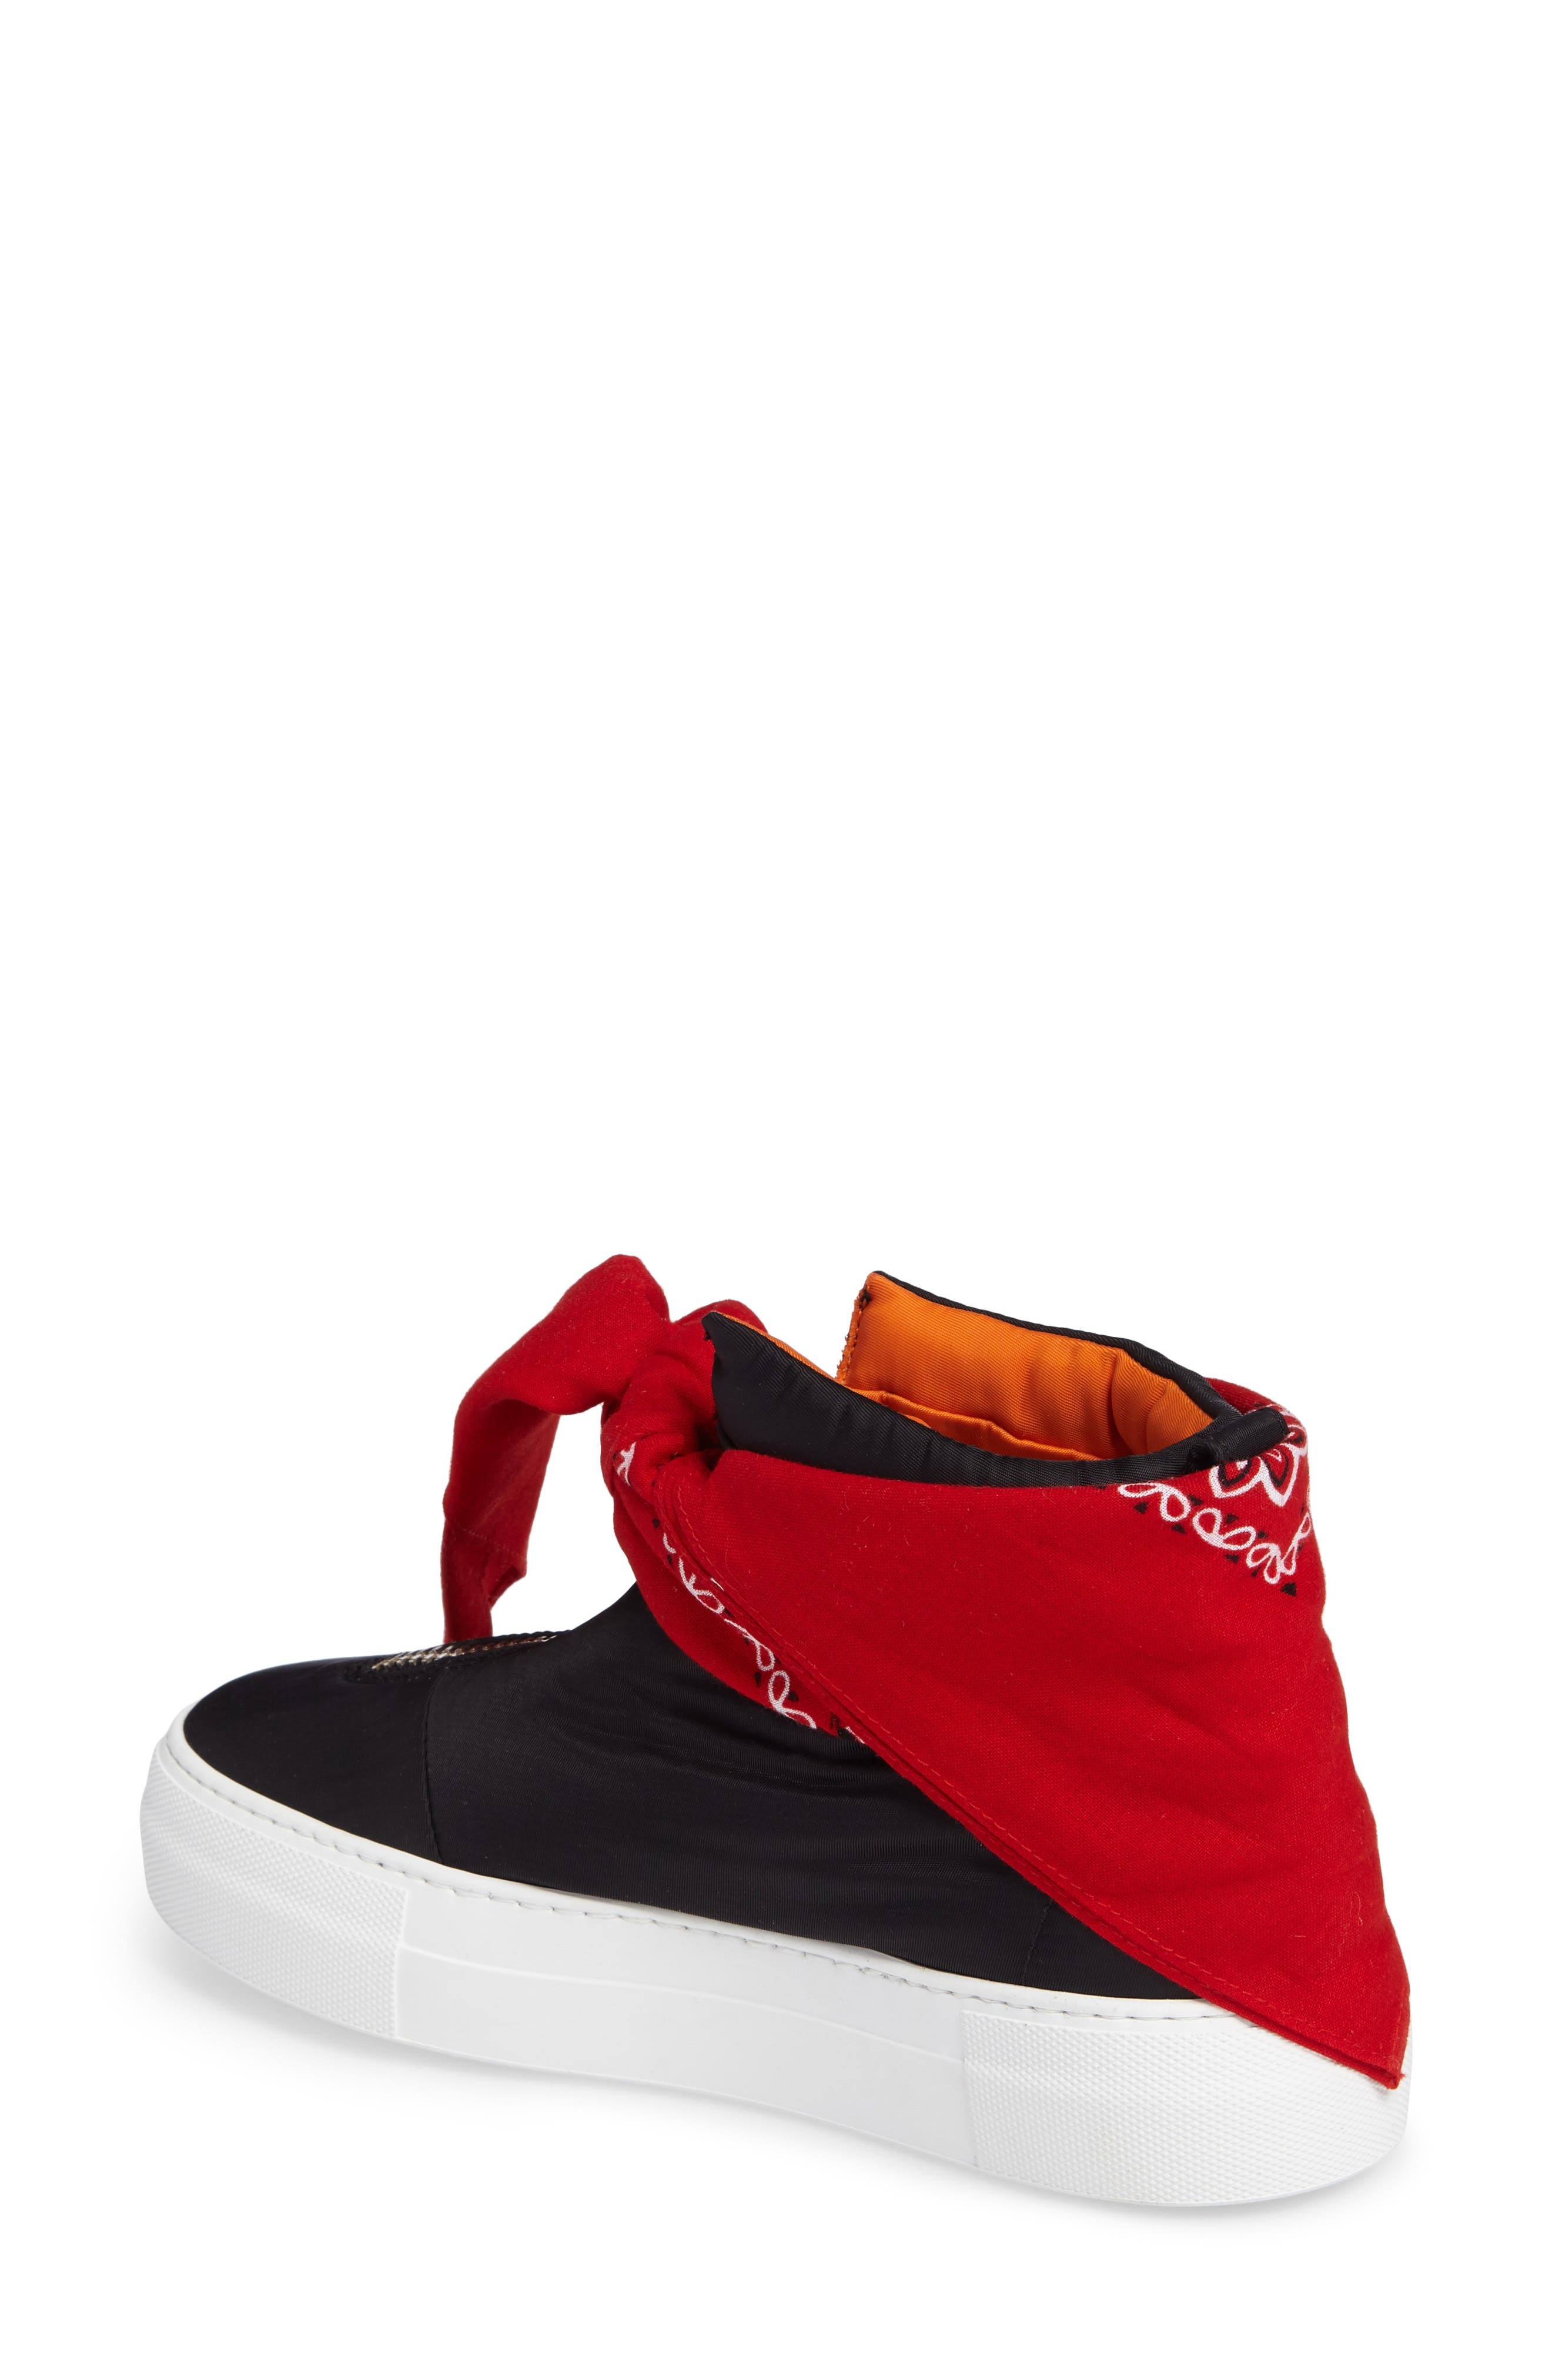 Alternate Image 2  - Joshua Sanders Bandana High Top Sneaker (Women)